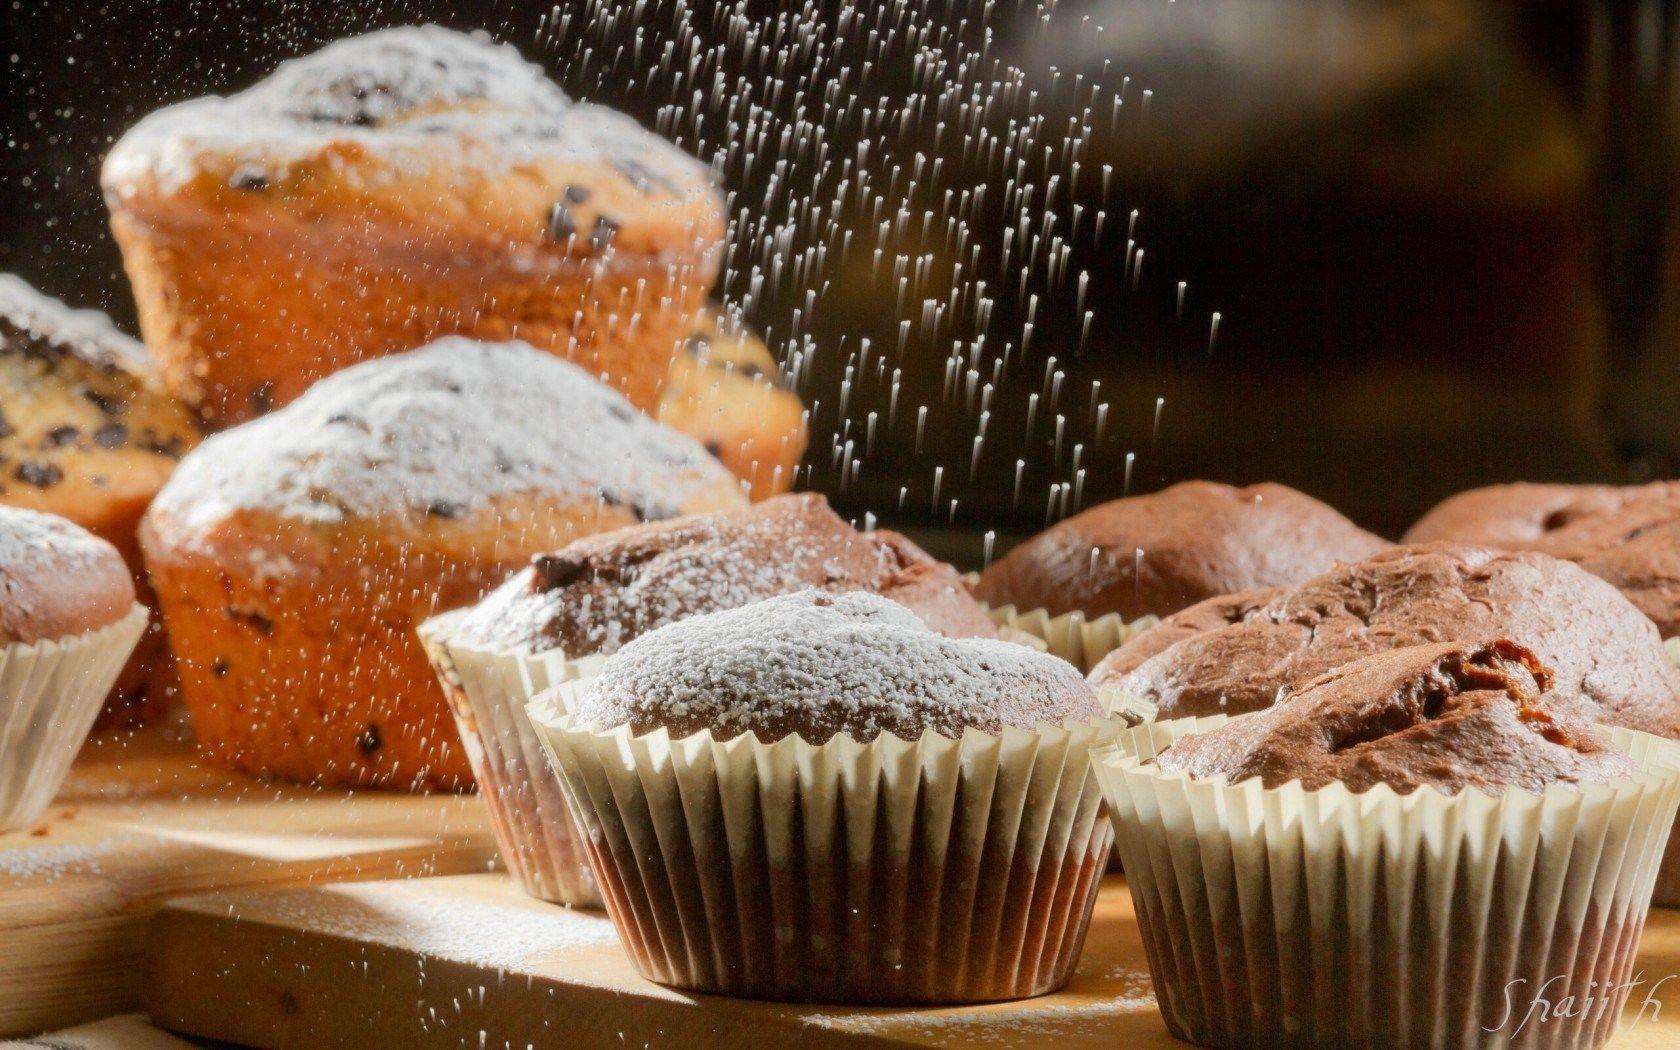 Cupcakes Icing Sugar Baking wallpaper | 1680x1050 | #24248